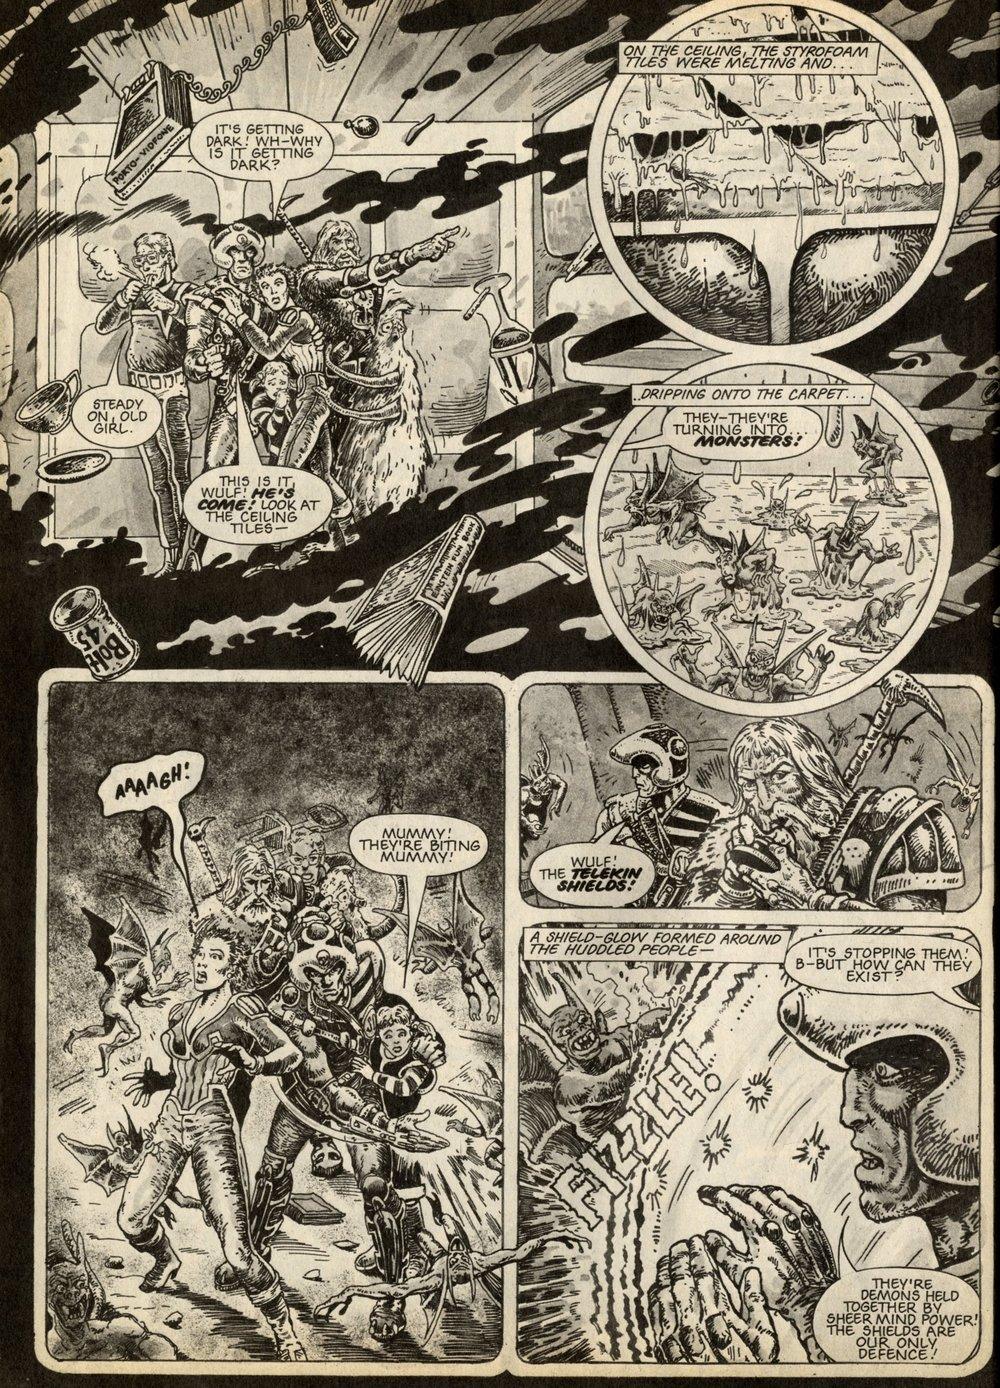 Strontium Dog: John Wagner (writer), Brendan McCarthy (artist)